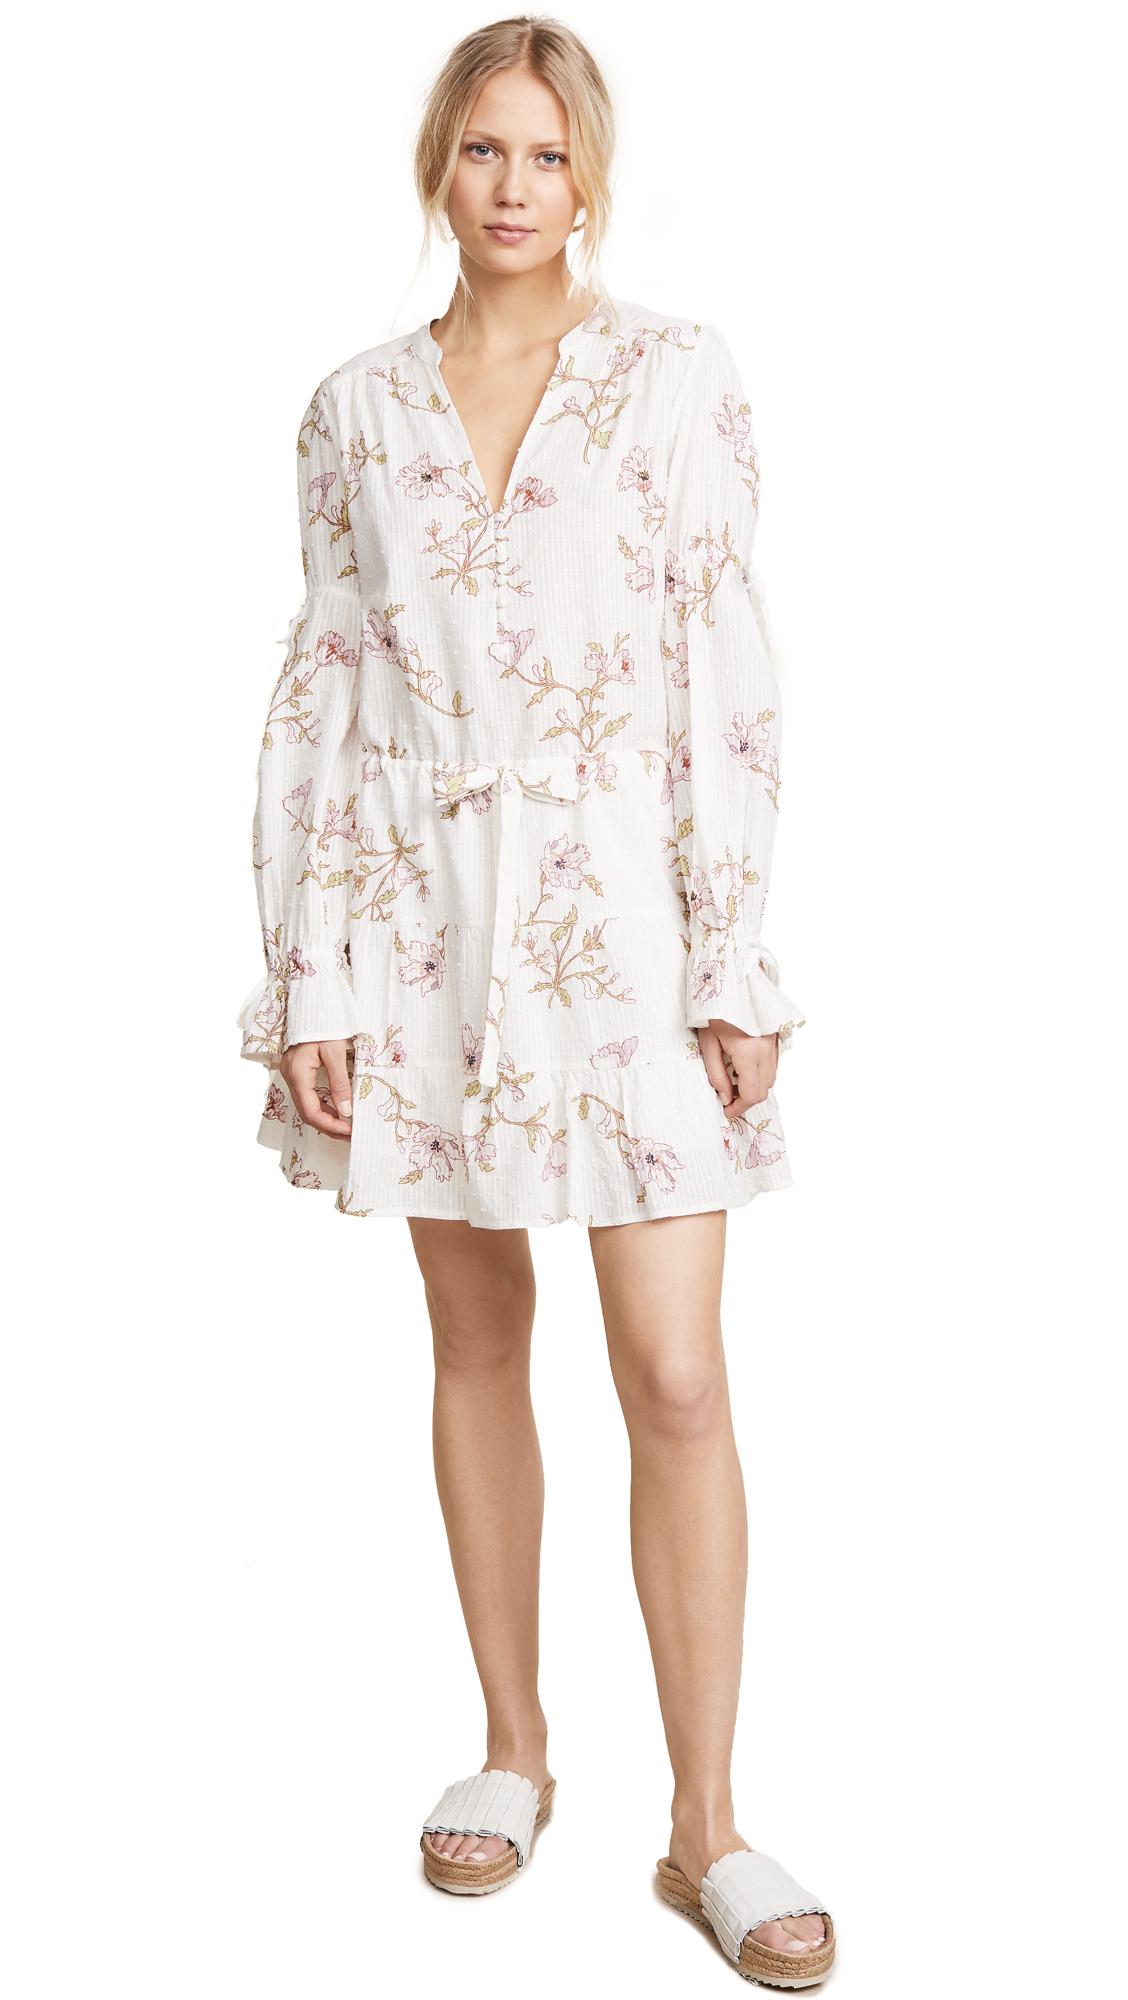 PAIGE Yardley Dress